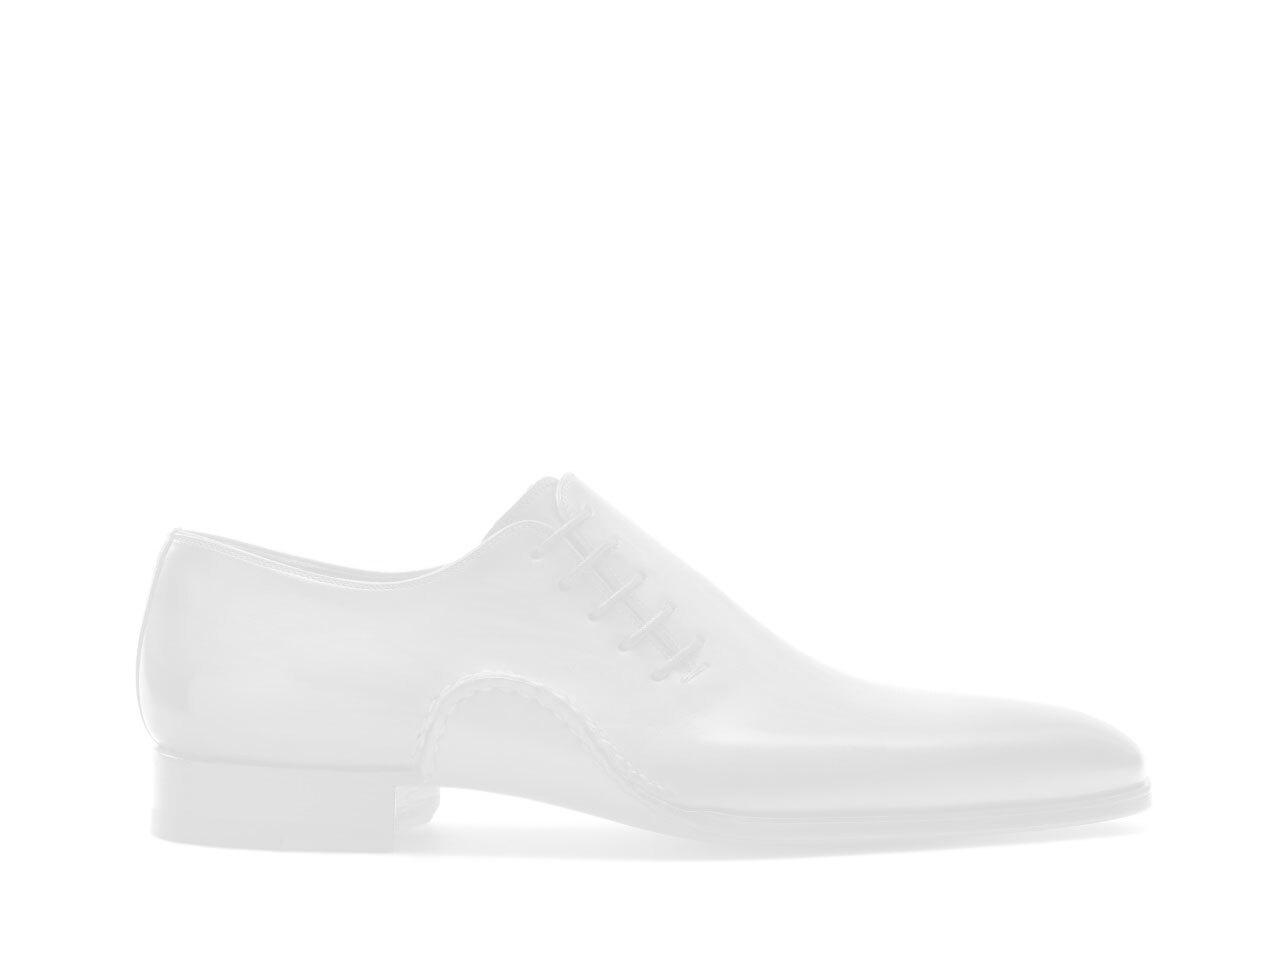 Pair of the Magnanni Lagos Royal Men's Oxford Shoes